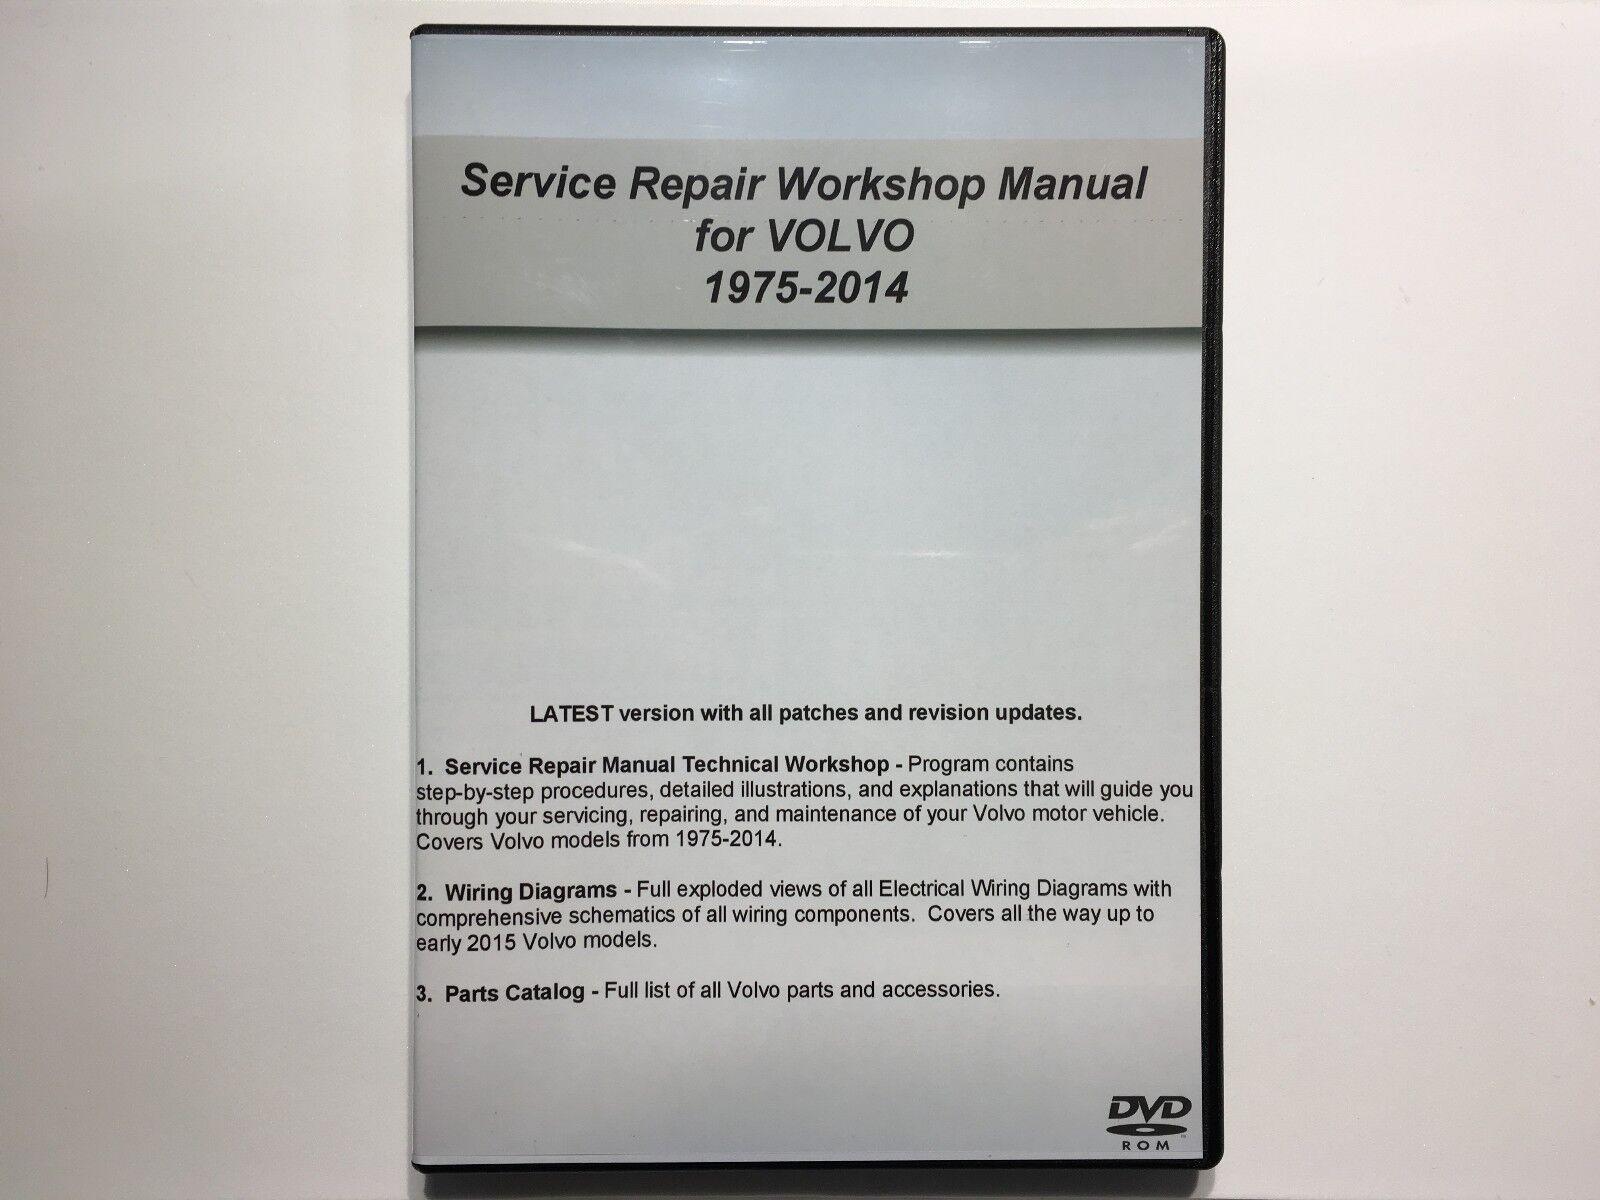 Car Dvd Wiring Diagram Complete Car Engine Scheme And Wiring Diagram